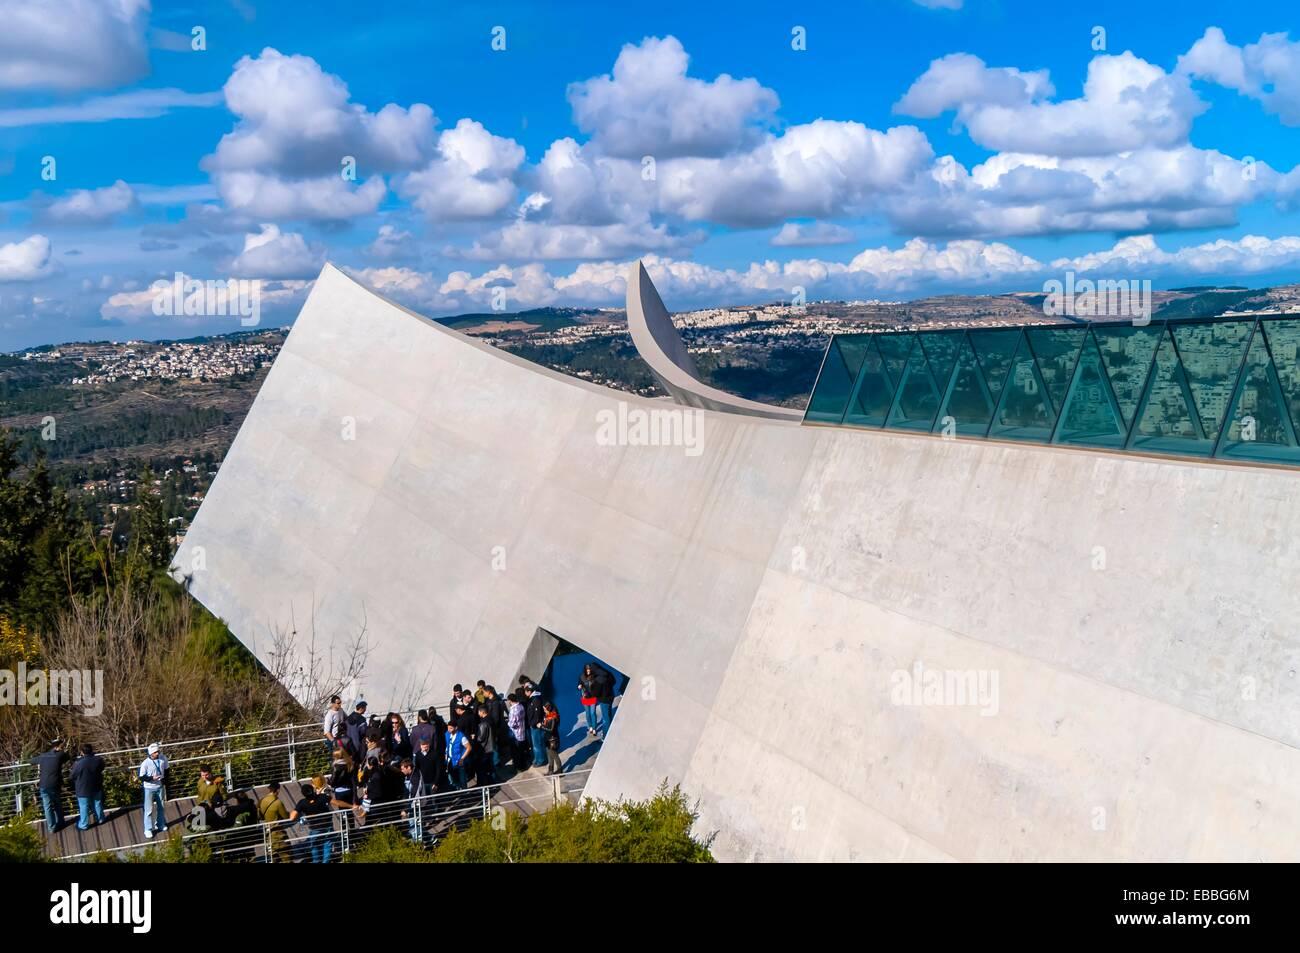 Yad Vashem The Holocaust Martyrs´ and Heroes´ Remembrance Authority Jerusalem Israel - Stock Image